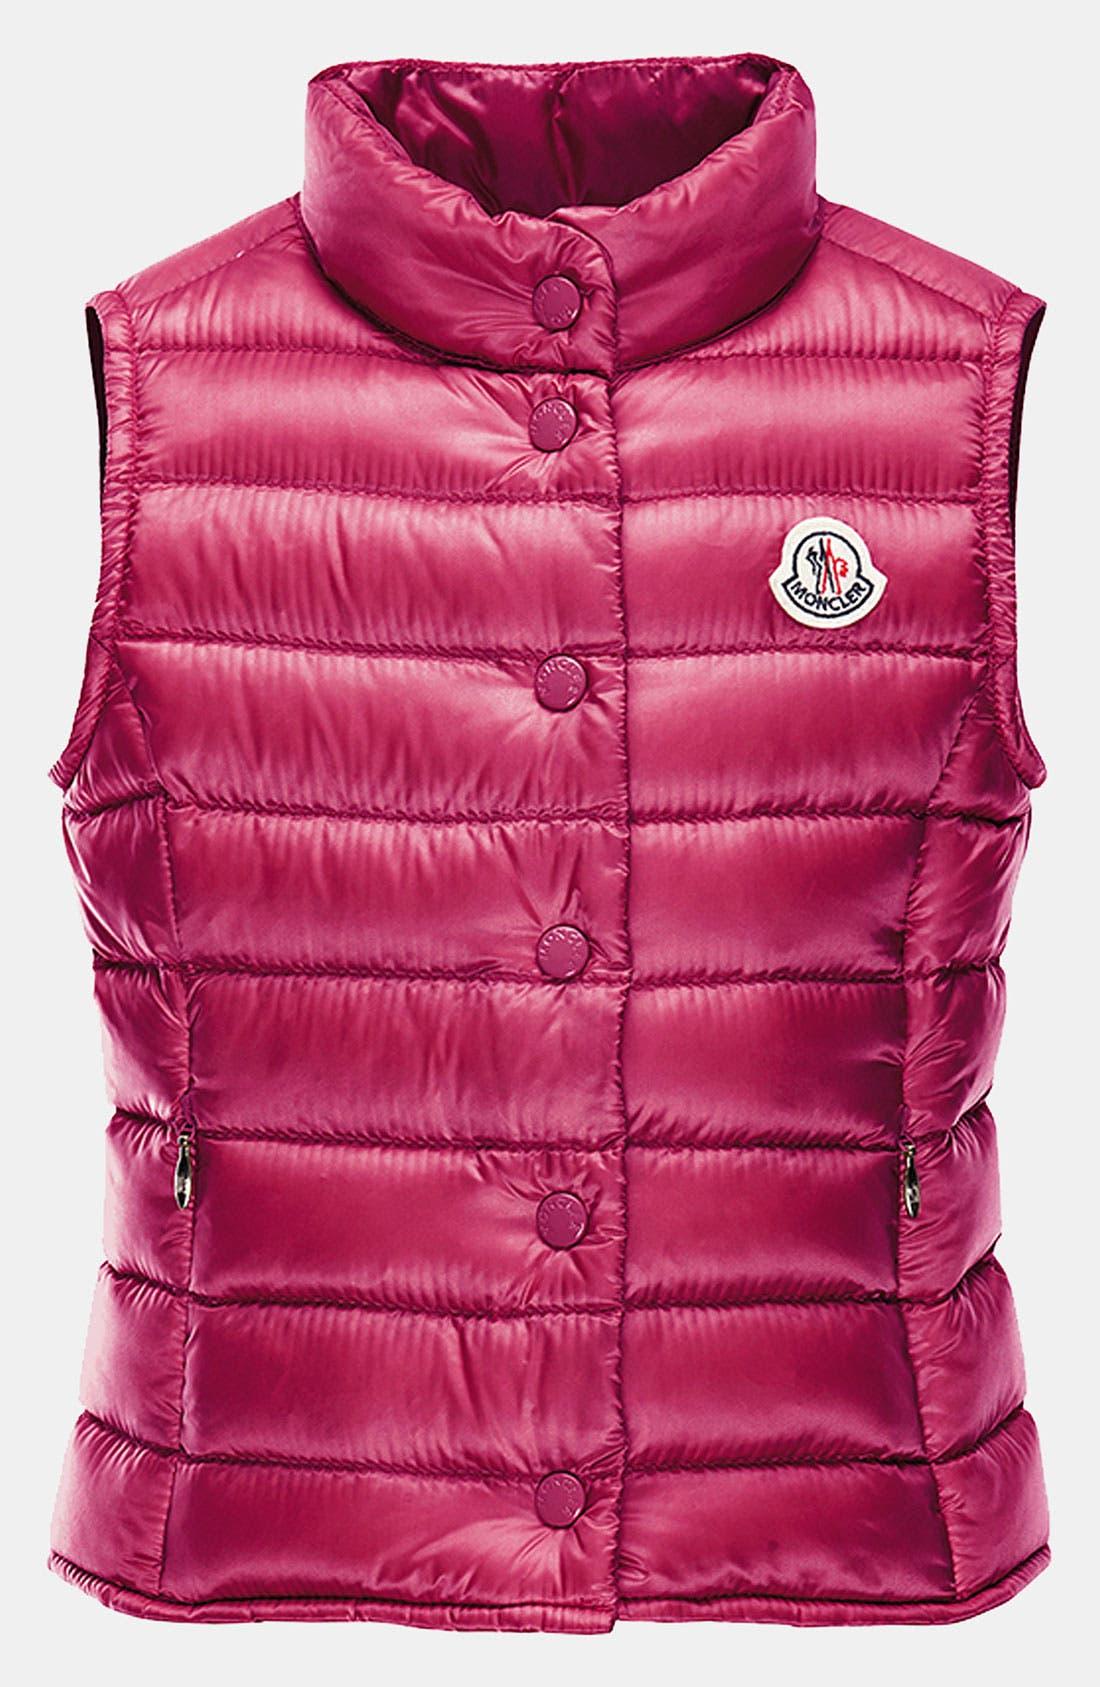 Alternate Image 1 Selected - Moncler 'Liane' Vest (Toddler, Little Girls & Big Girls)